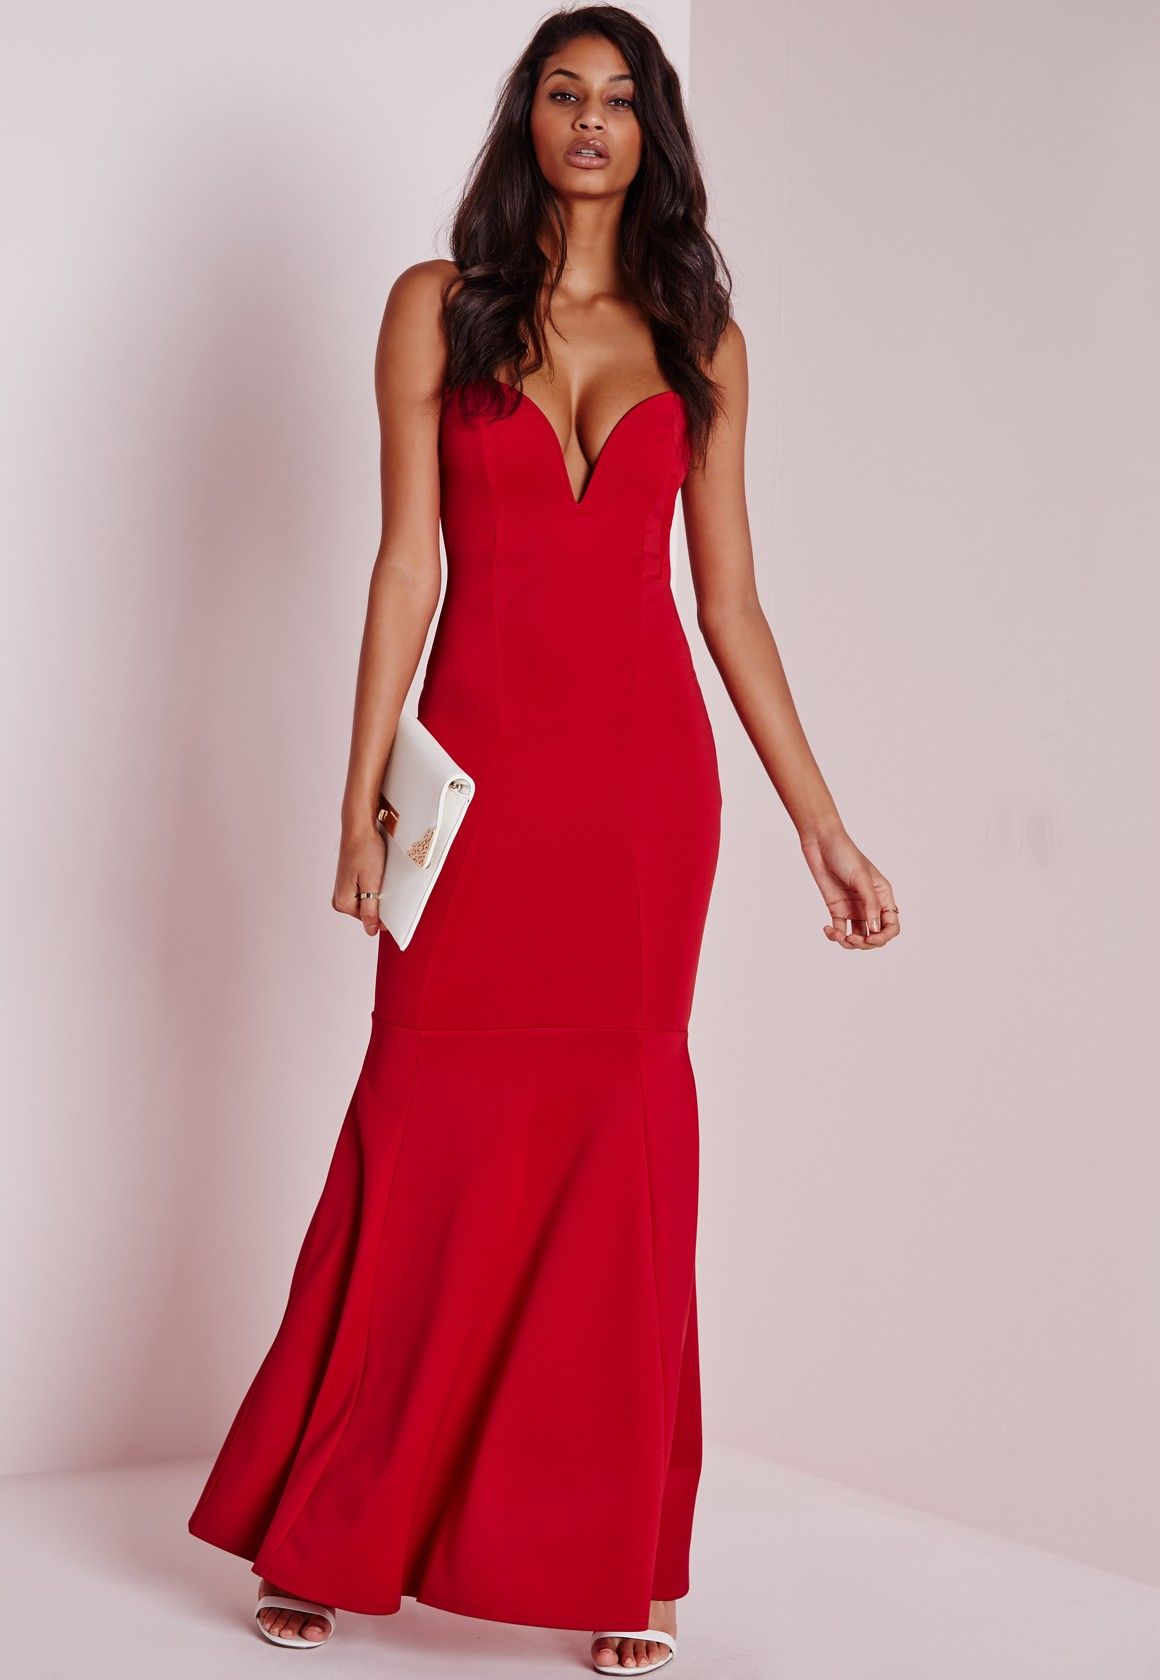 Missguided Sweetheart Neck Maxi Dress Red Maxi Skirt Dress Formal Dresses Classy Red Dress Maxi [ 1680 x 1160 Pixel ]